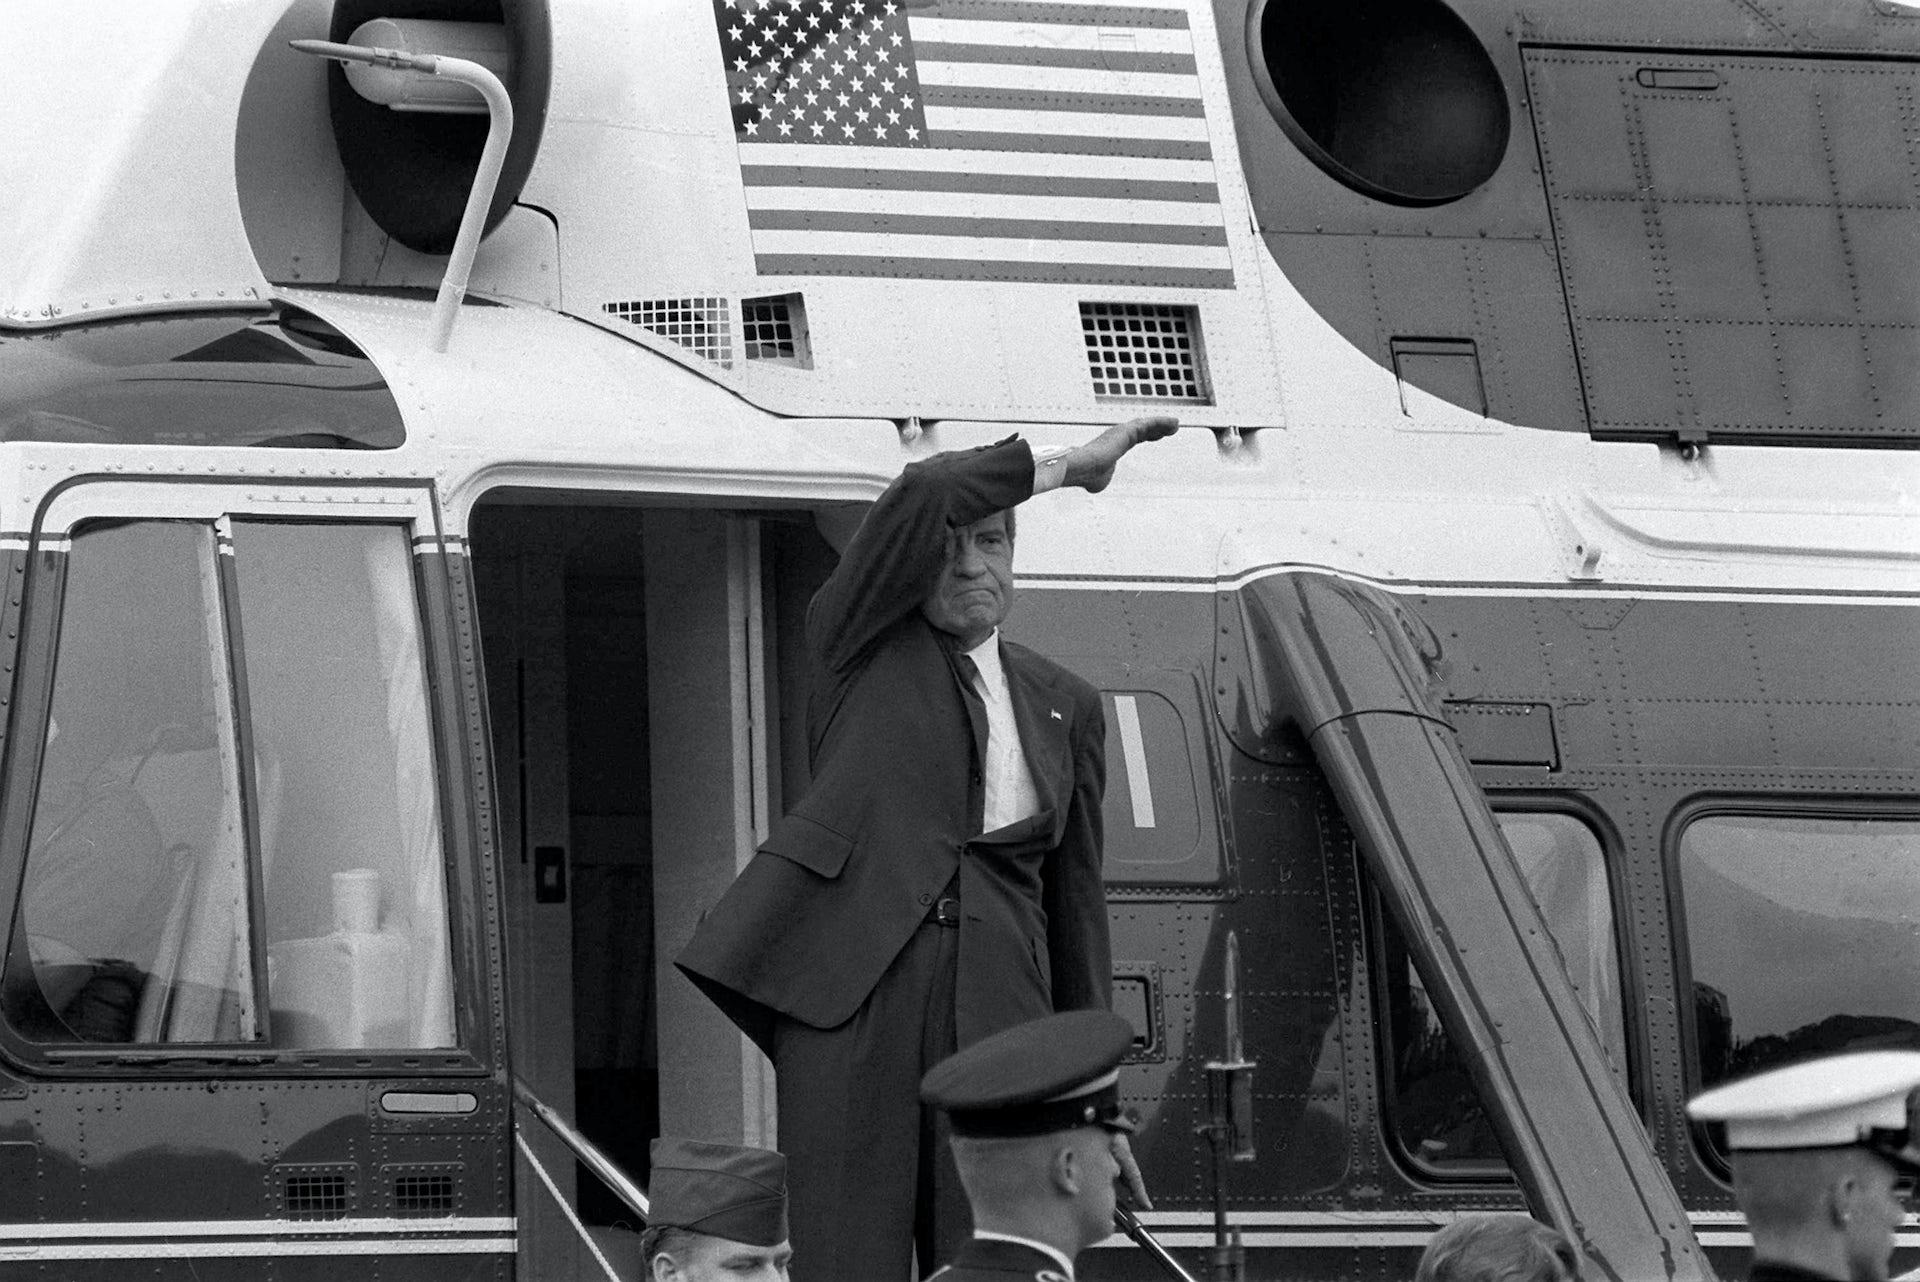 Will Trump's use of executive privilege help him avoid congressional oversight? It didn't help Richard Nixon